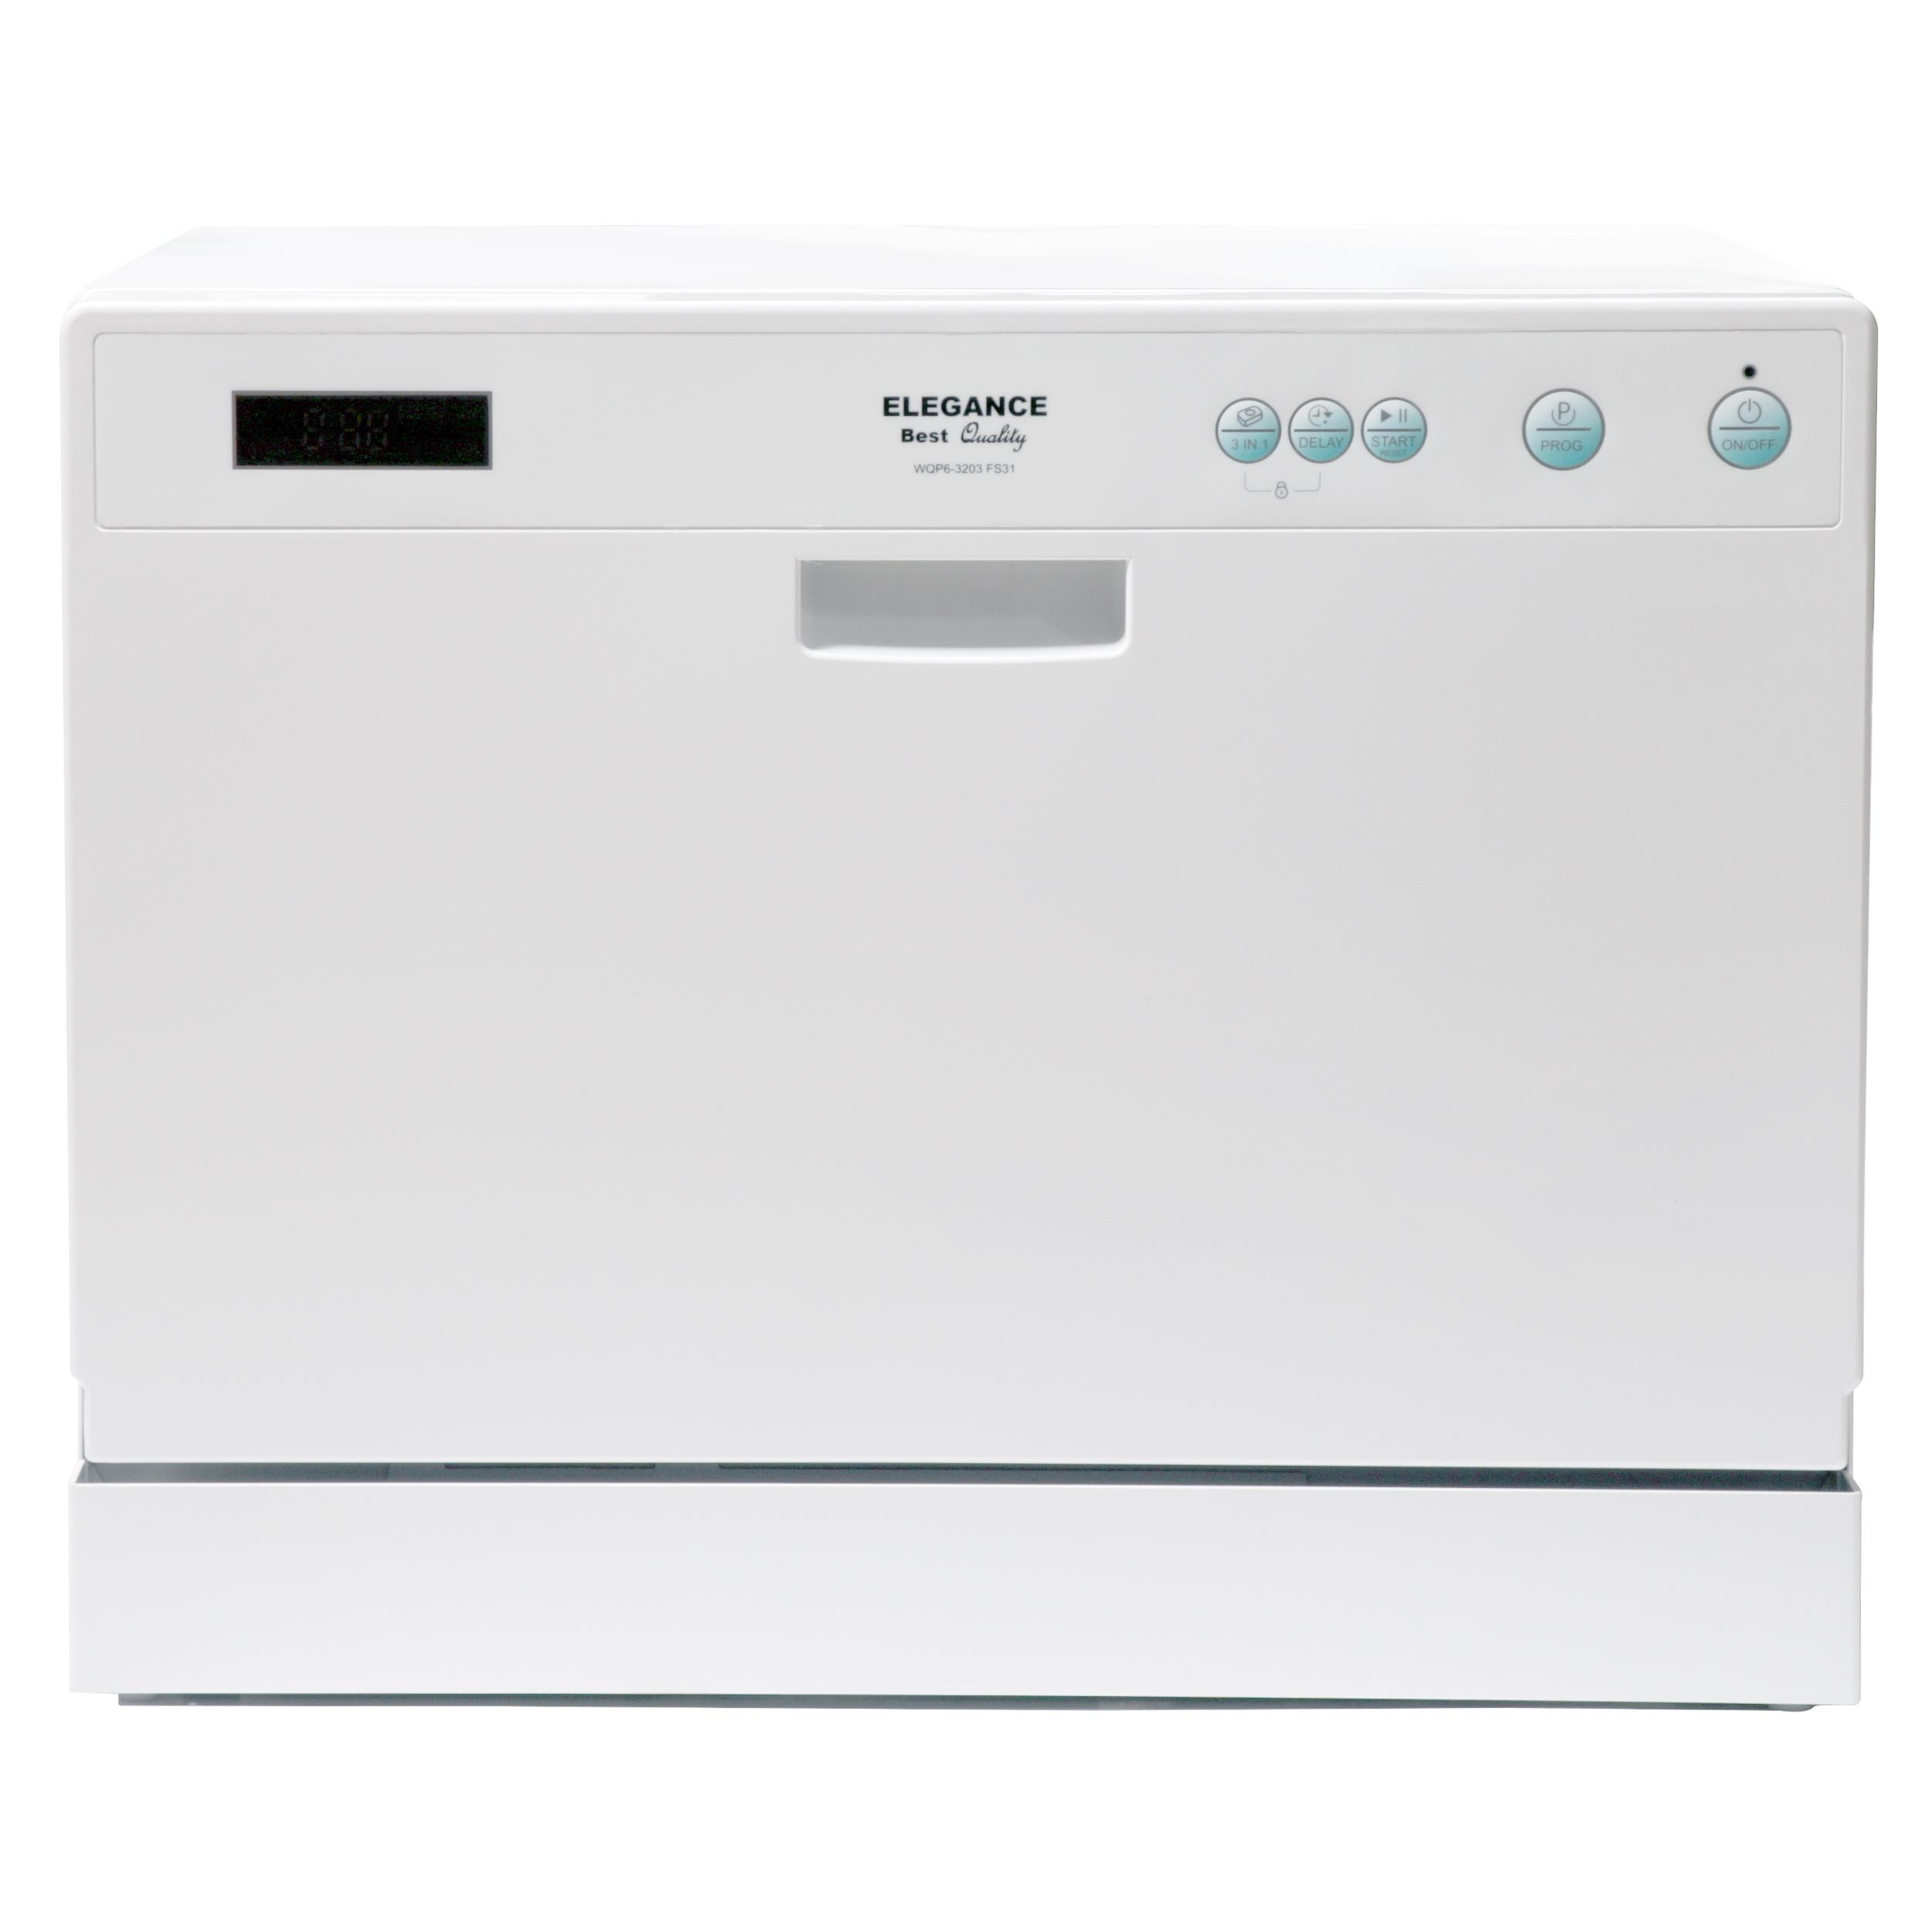 ماشین ظرفشویی الگانس مدل WQP6-3203 FS31